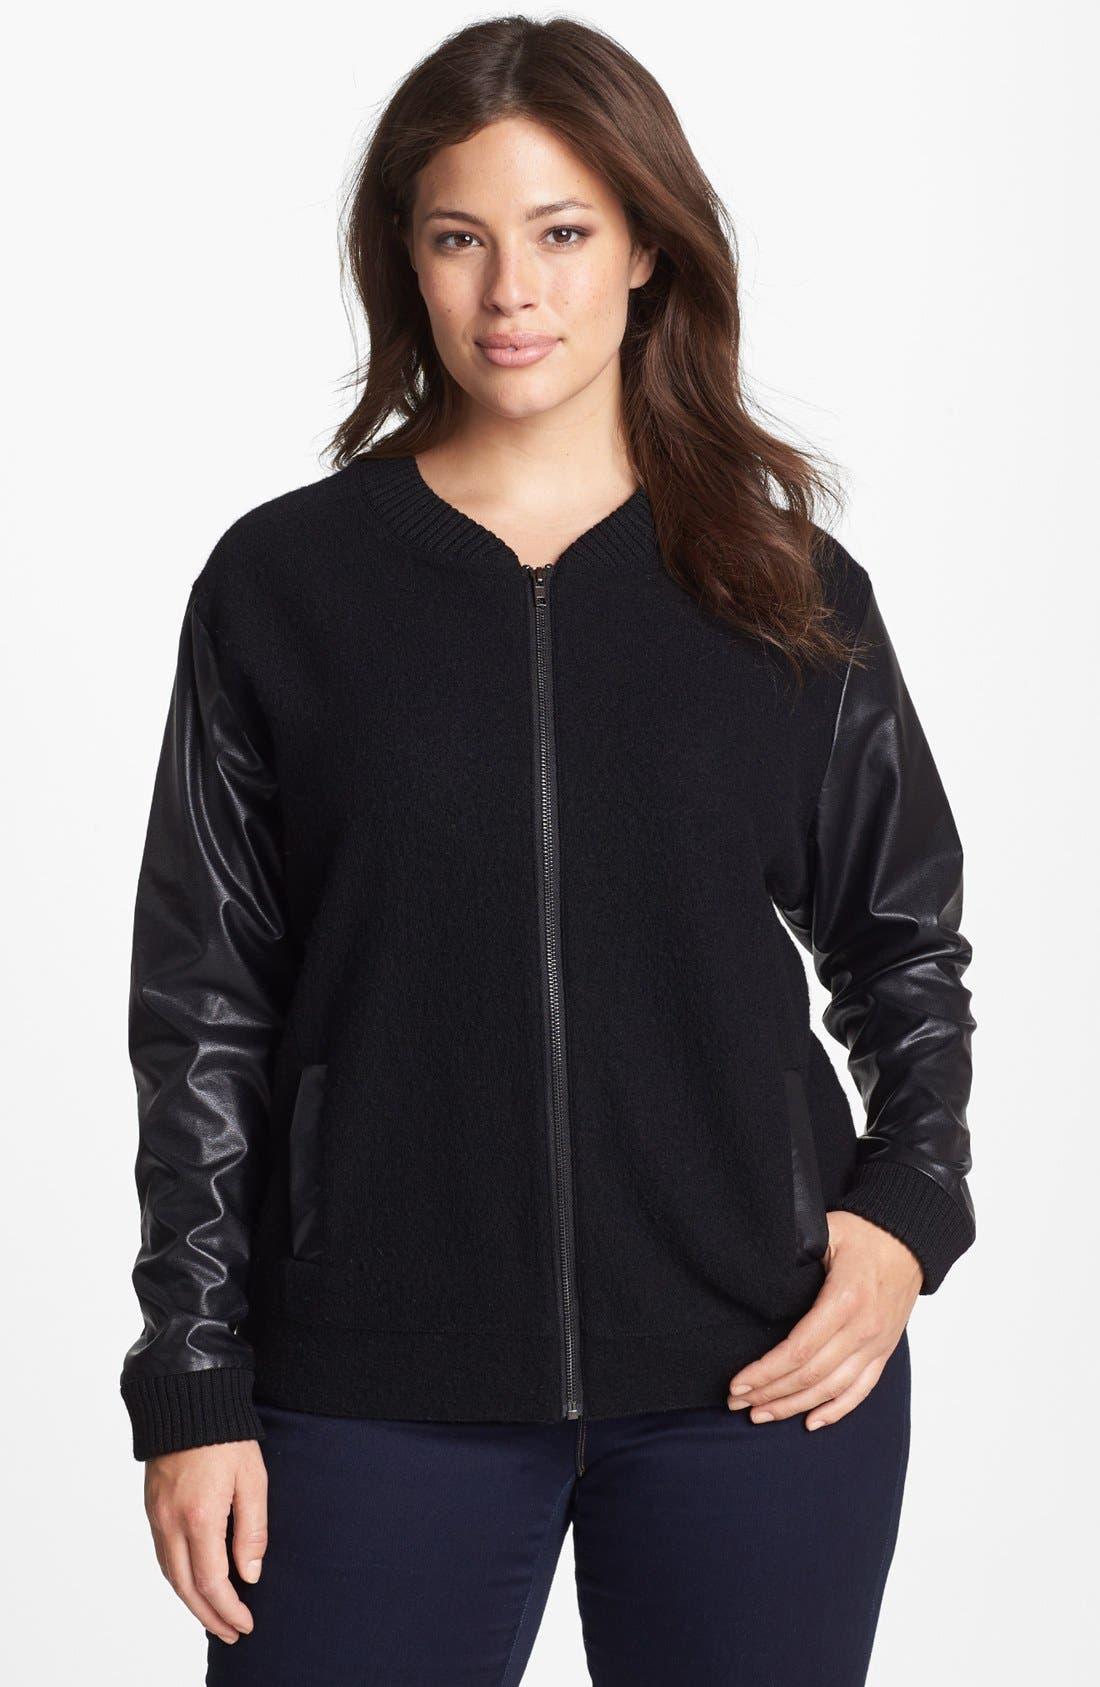 Alternate Image 1 Selected - Halogen® Wool & Faux Leather Jacket (Plus Size)